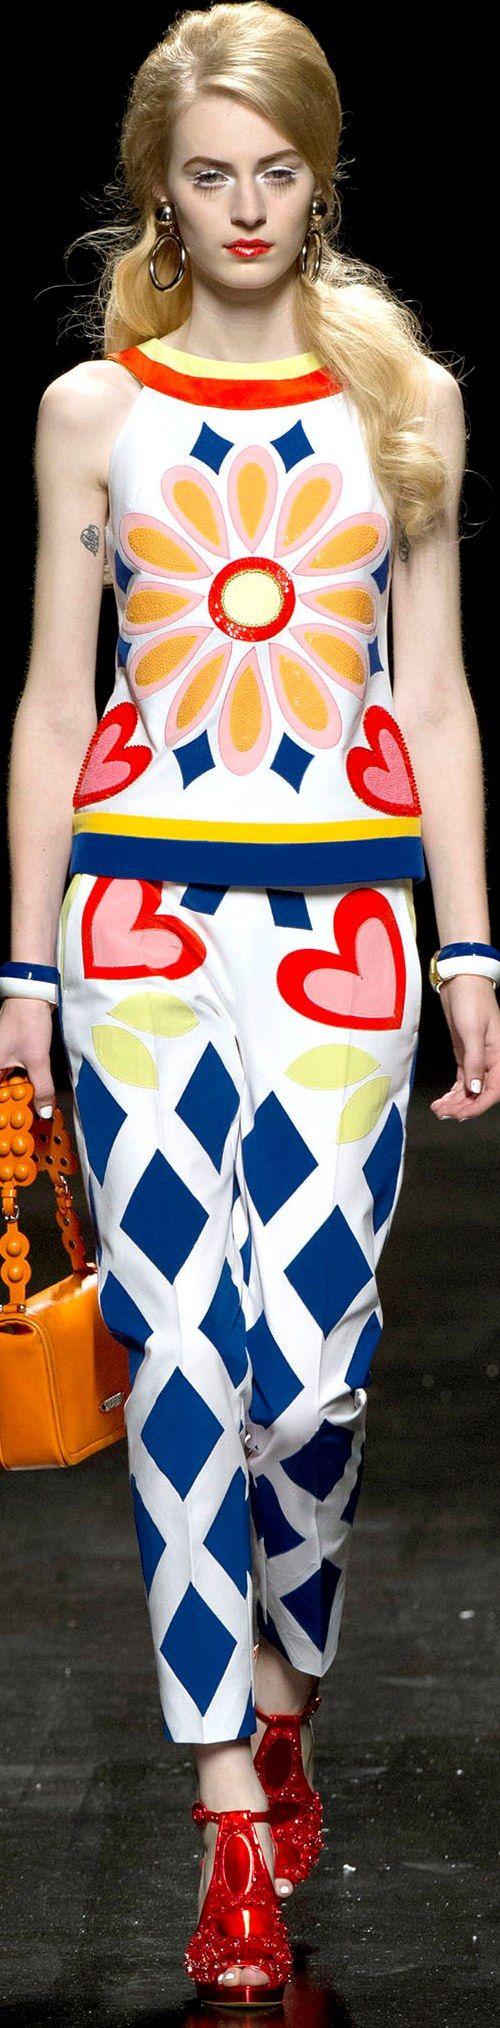 Moschino Couture | Inna Erten